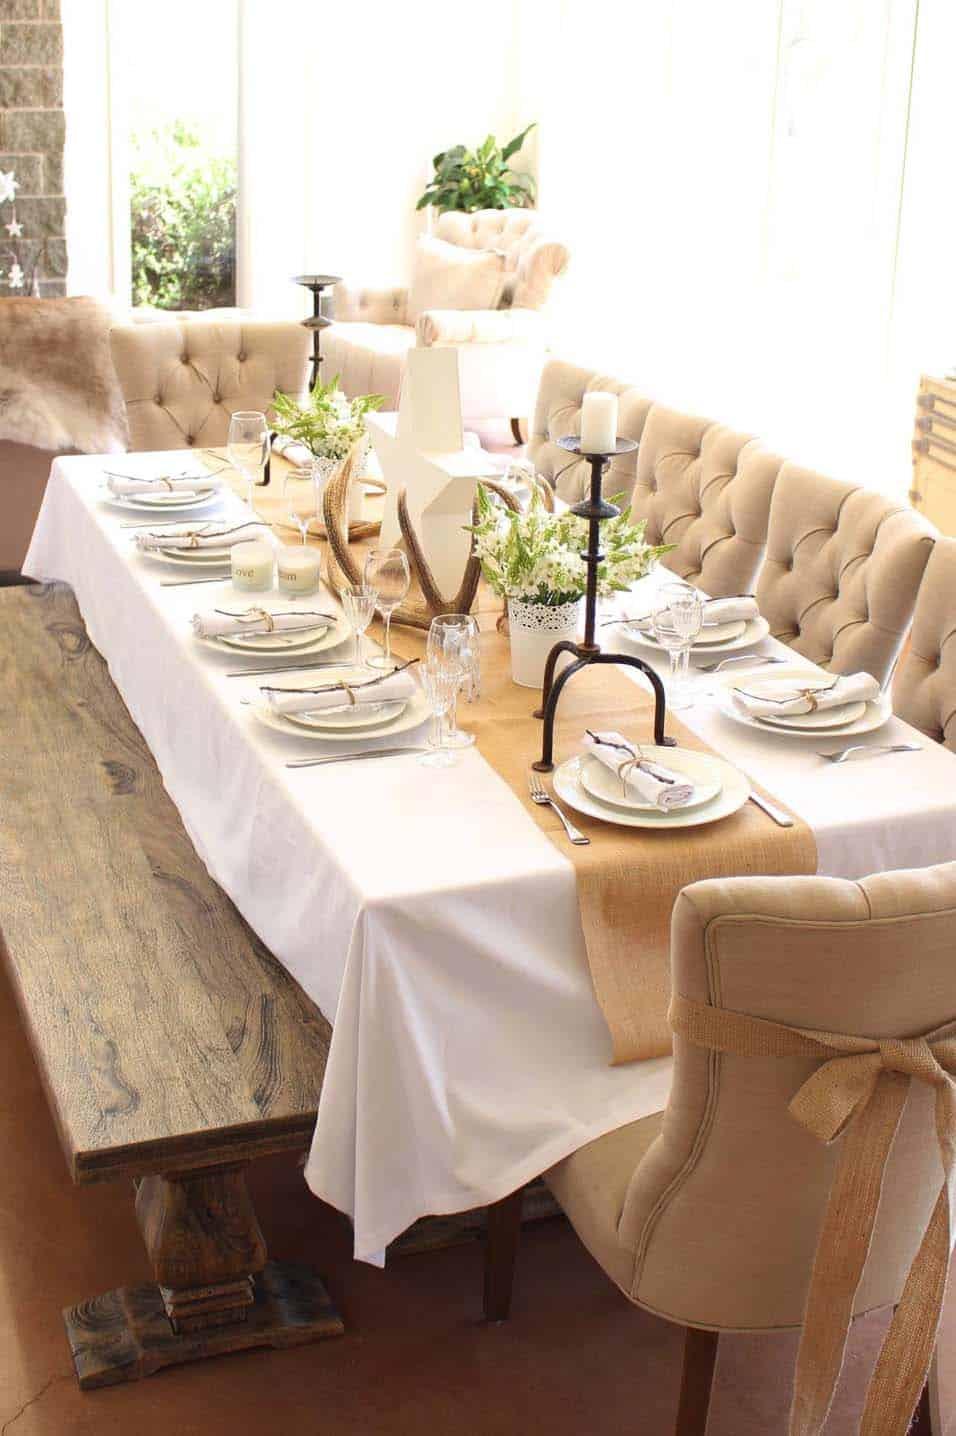 Inspiring Dining Table Christmas Decor Ideas-20-1 Kindesign